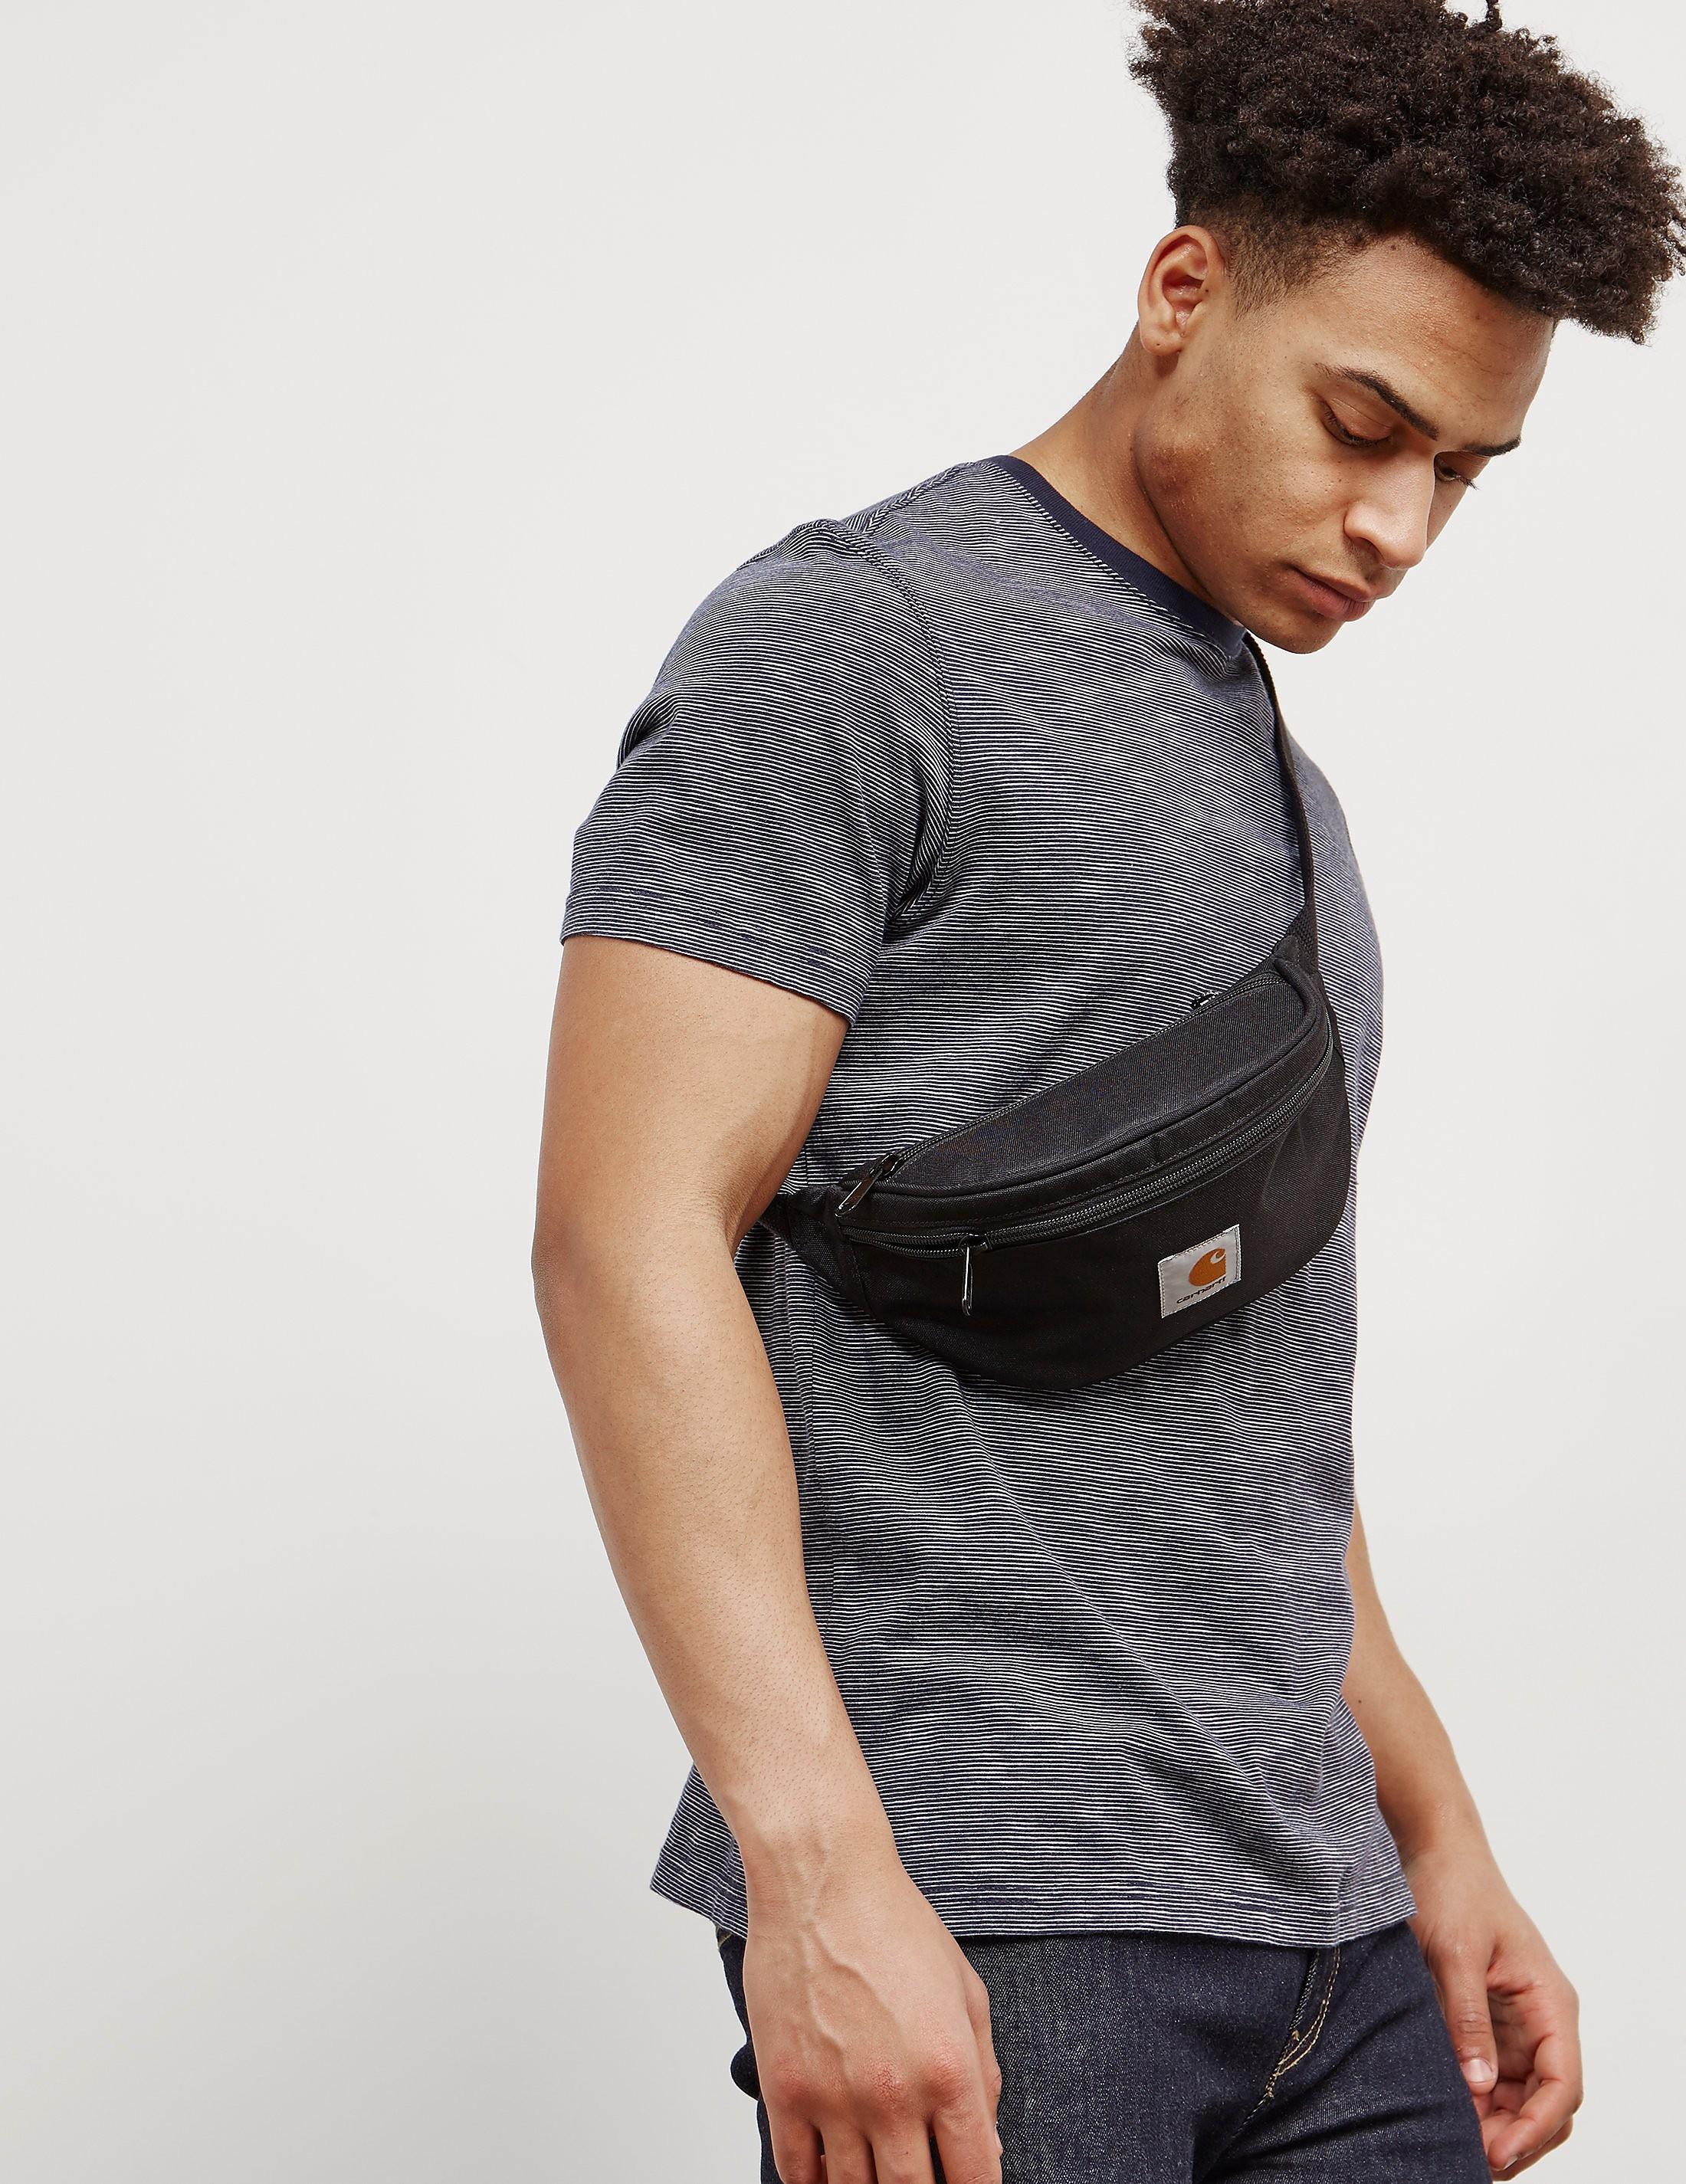 Carhartt WIP Watch Hip Bag